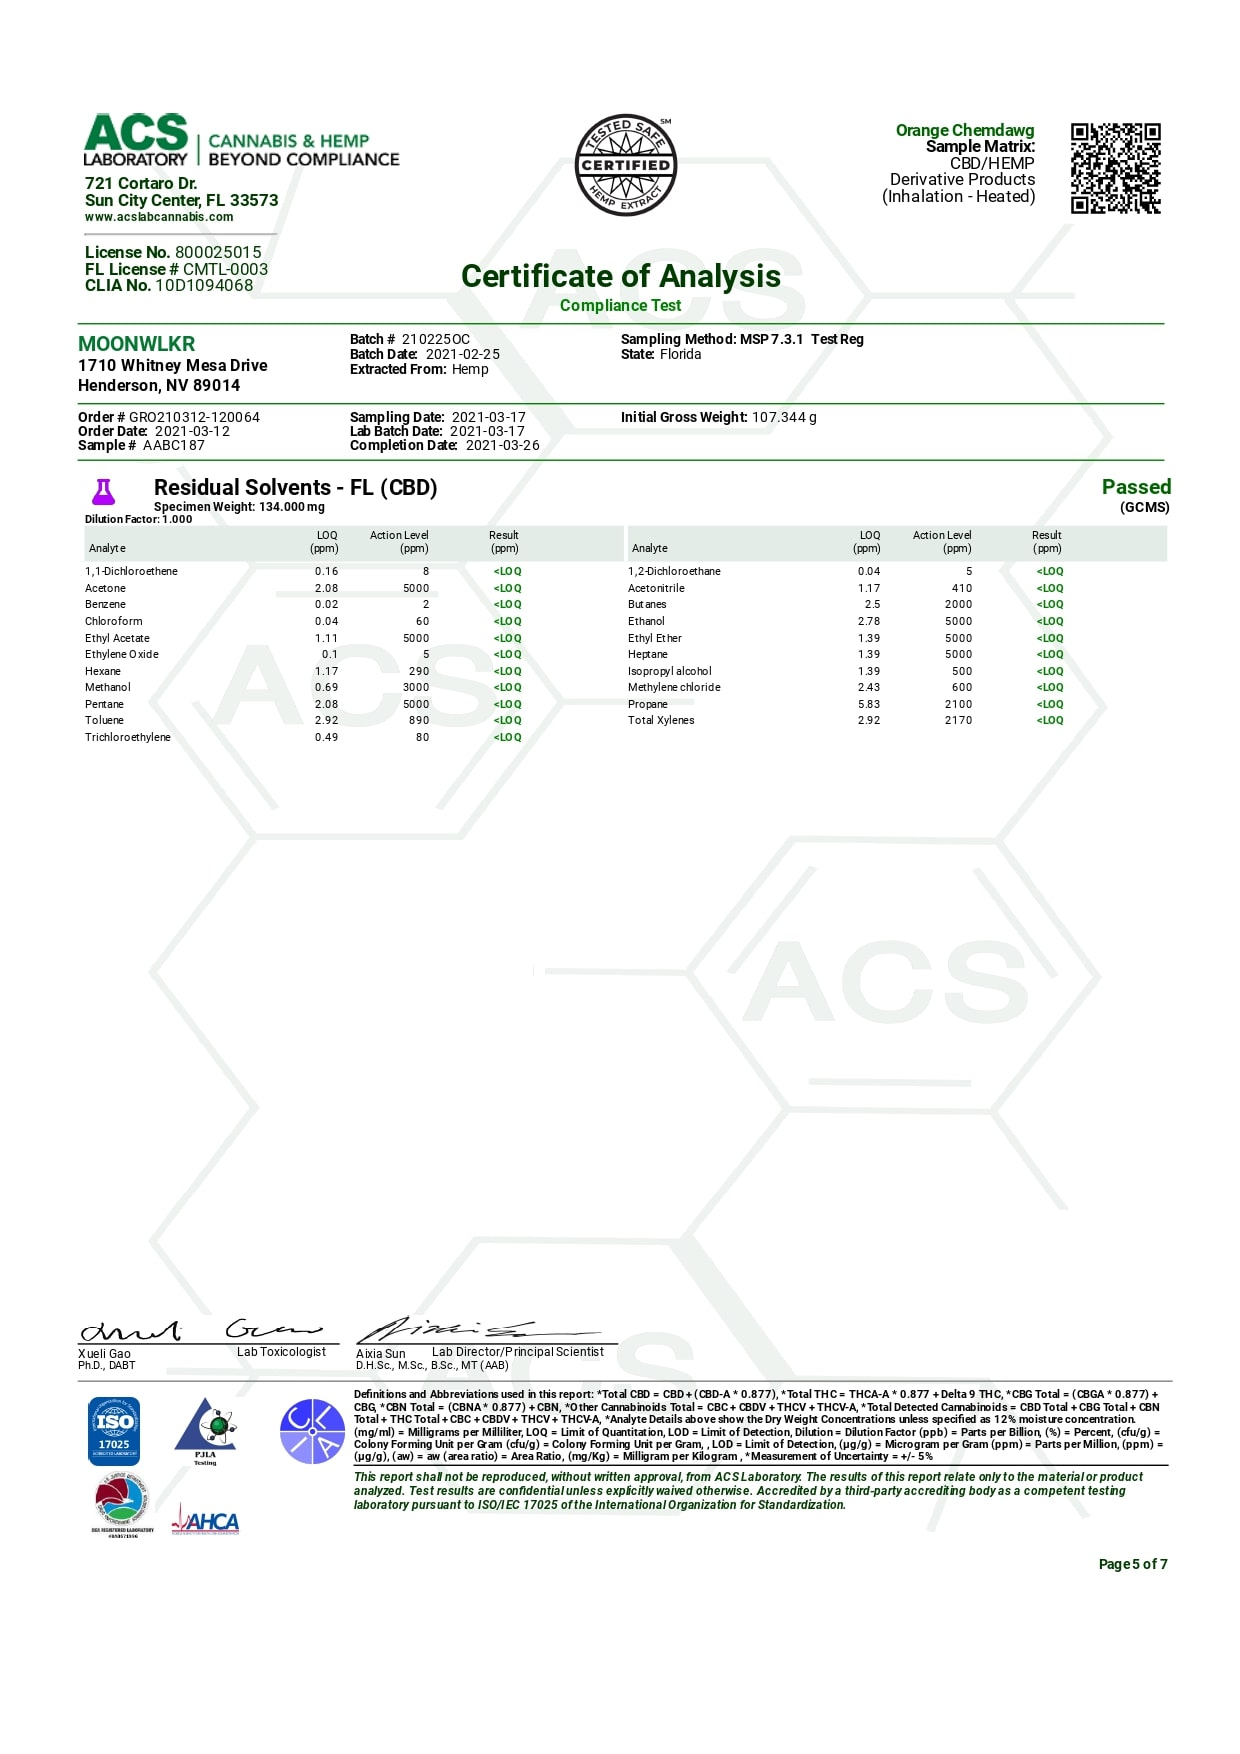 MoonWlkr Delta 8 THC Telesto Vape Cartridge Lab Report